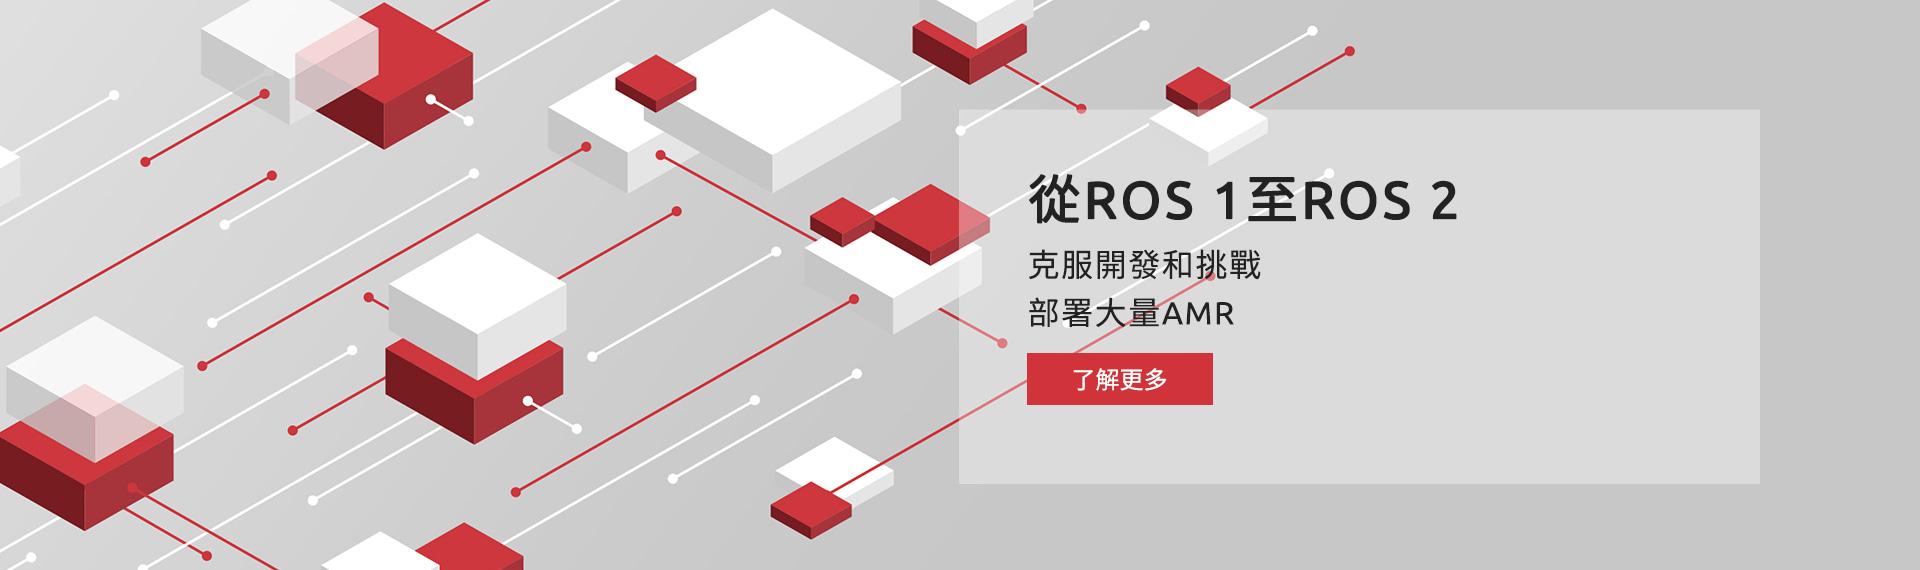 凌華科技 從 ROS 1至 ROS 2